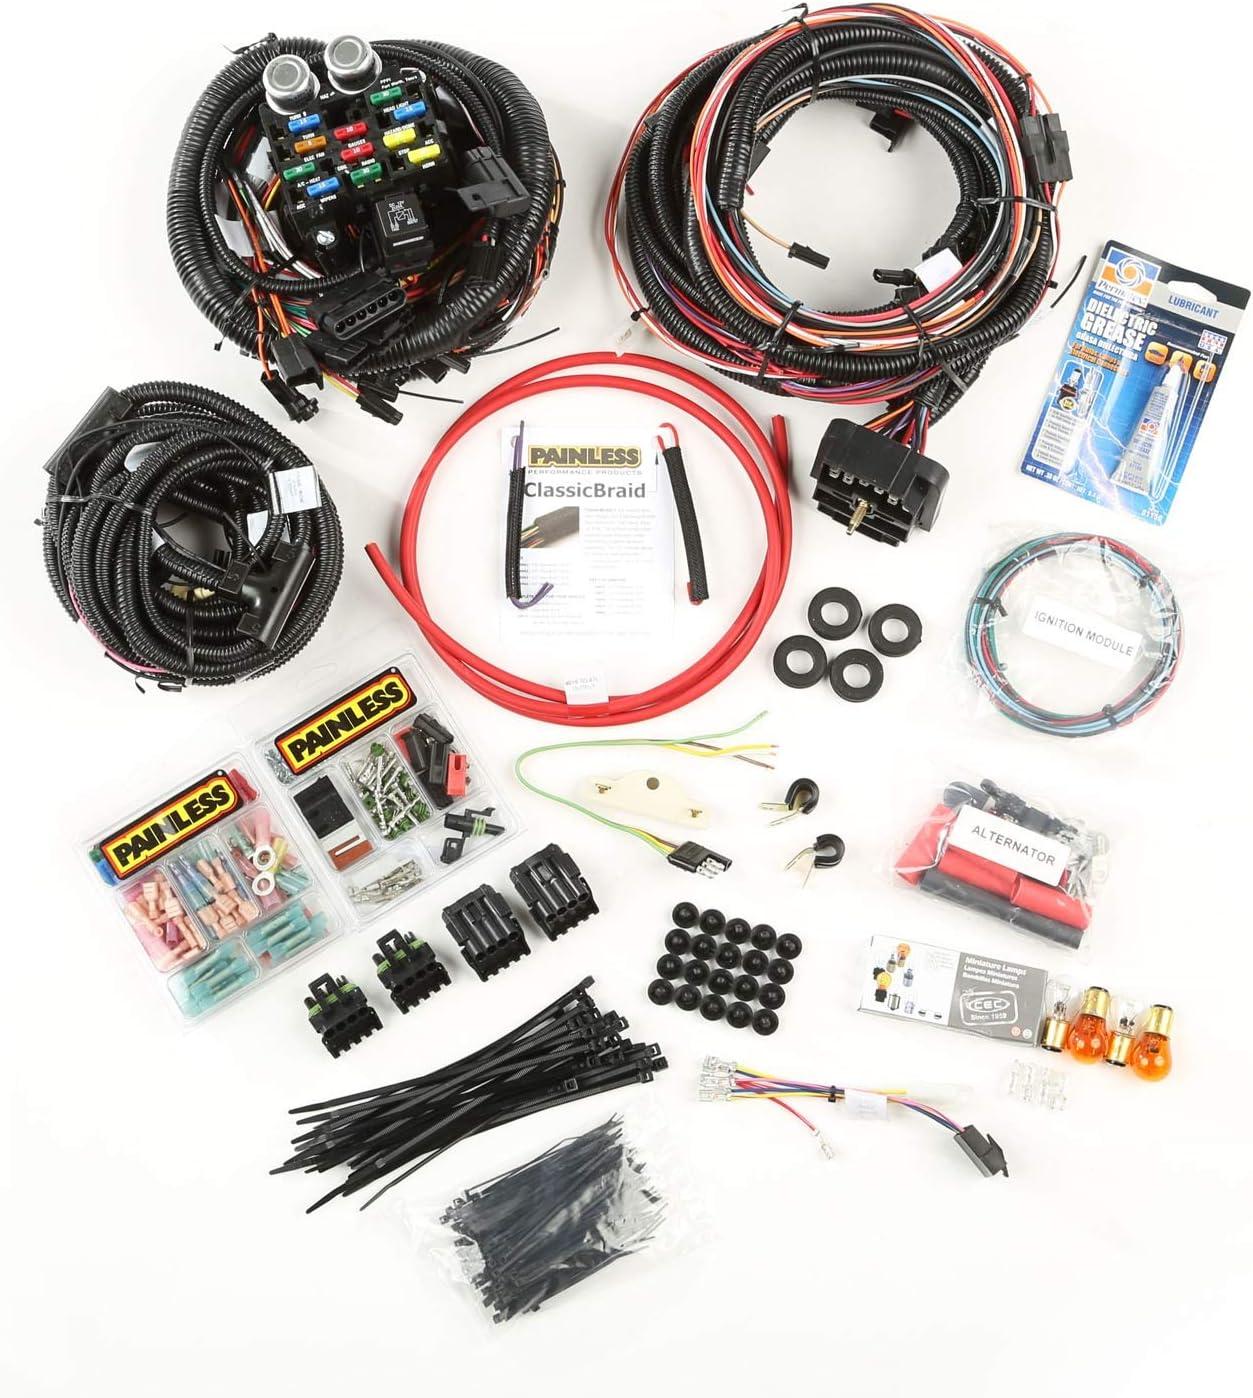 amazon.com: omix-ada 17202.04 painless wiring harness for jeep cj models:  automotive  amazon.com